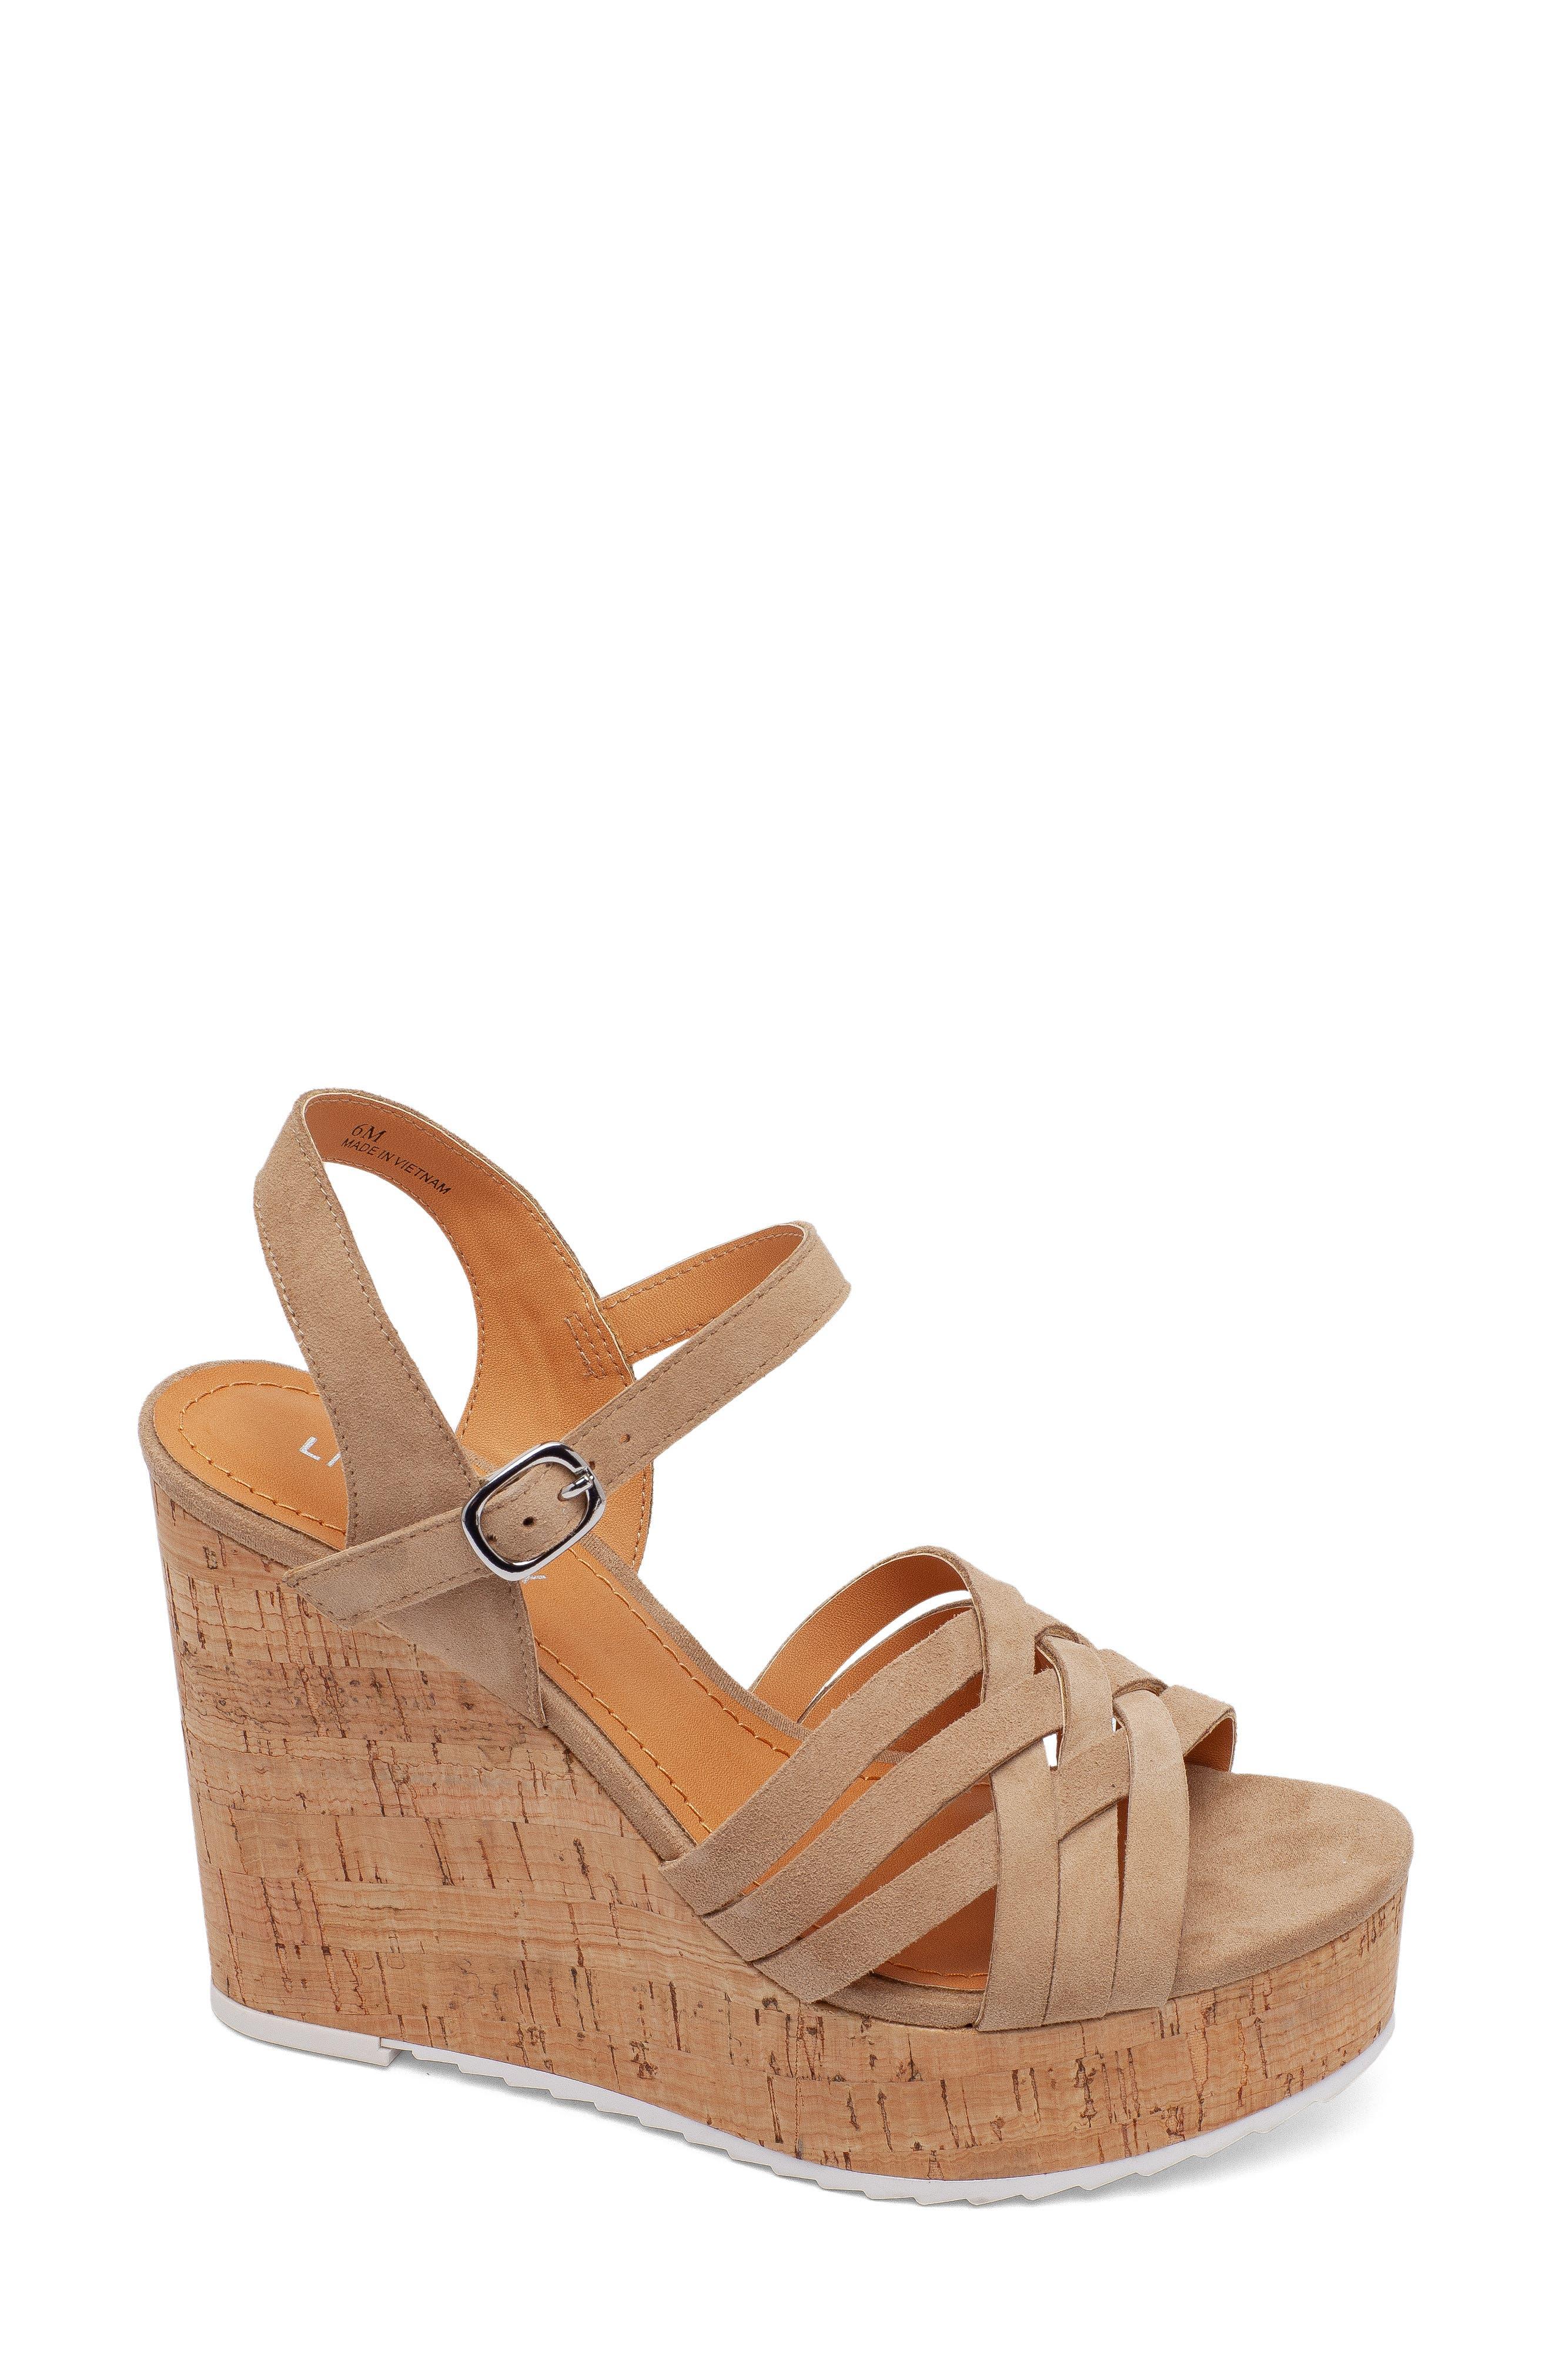 Glorious Platform Wedge Sandal